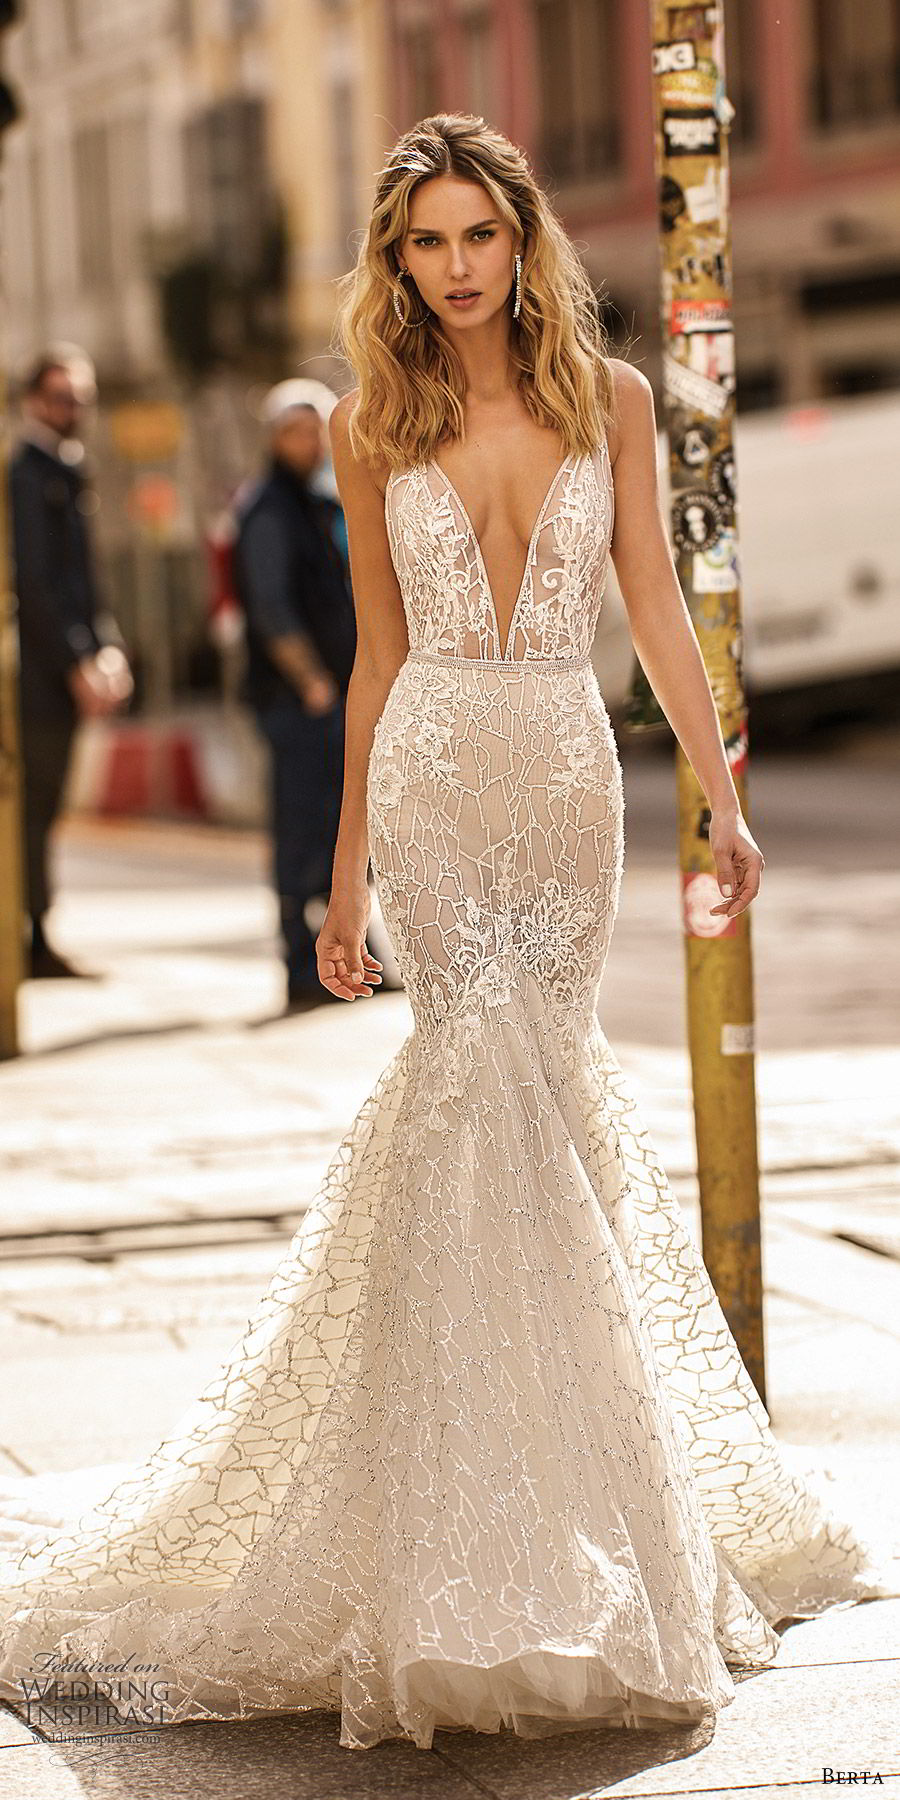 berta spring 2020 bridal sleevless deep v neckline fully embellished lace mermaid wedding dress (18) elegant glam low back chapel train mv